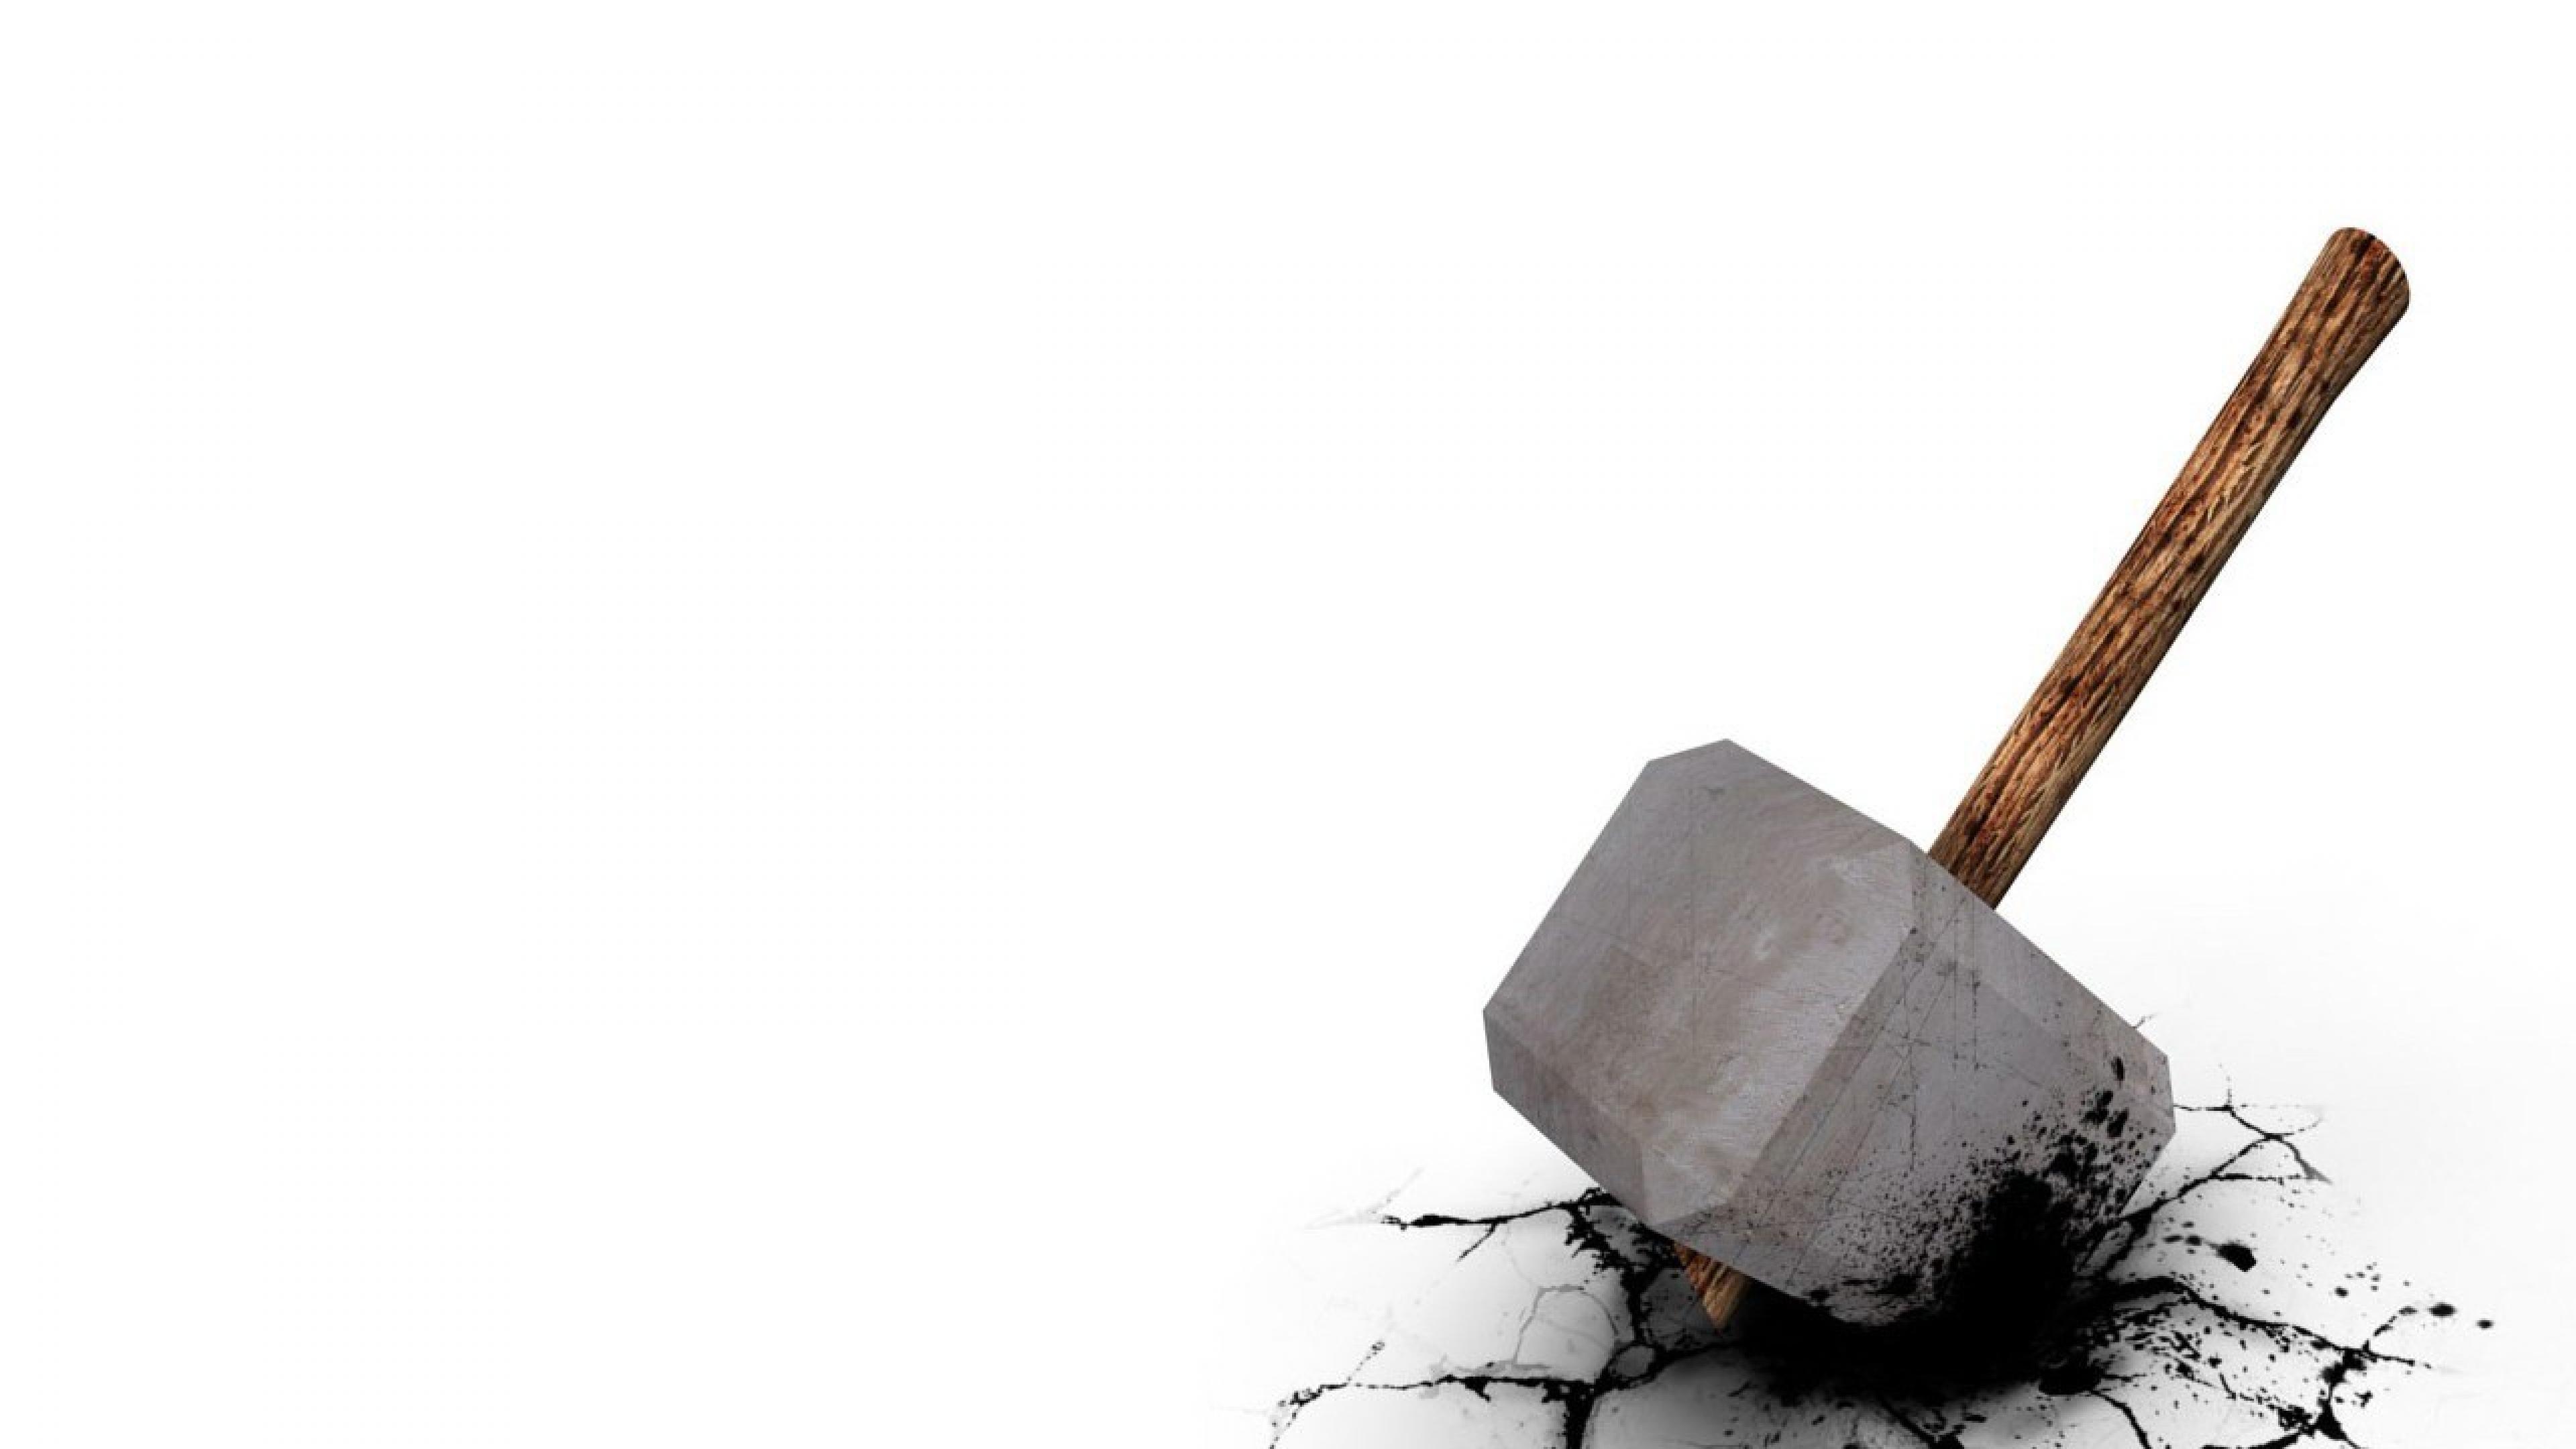 minimalism_hammer_crack_ultra_3840x2160_hd-wallpaper-1427